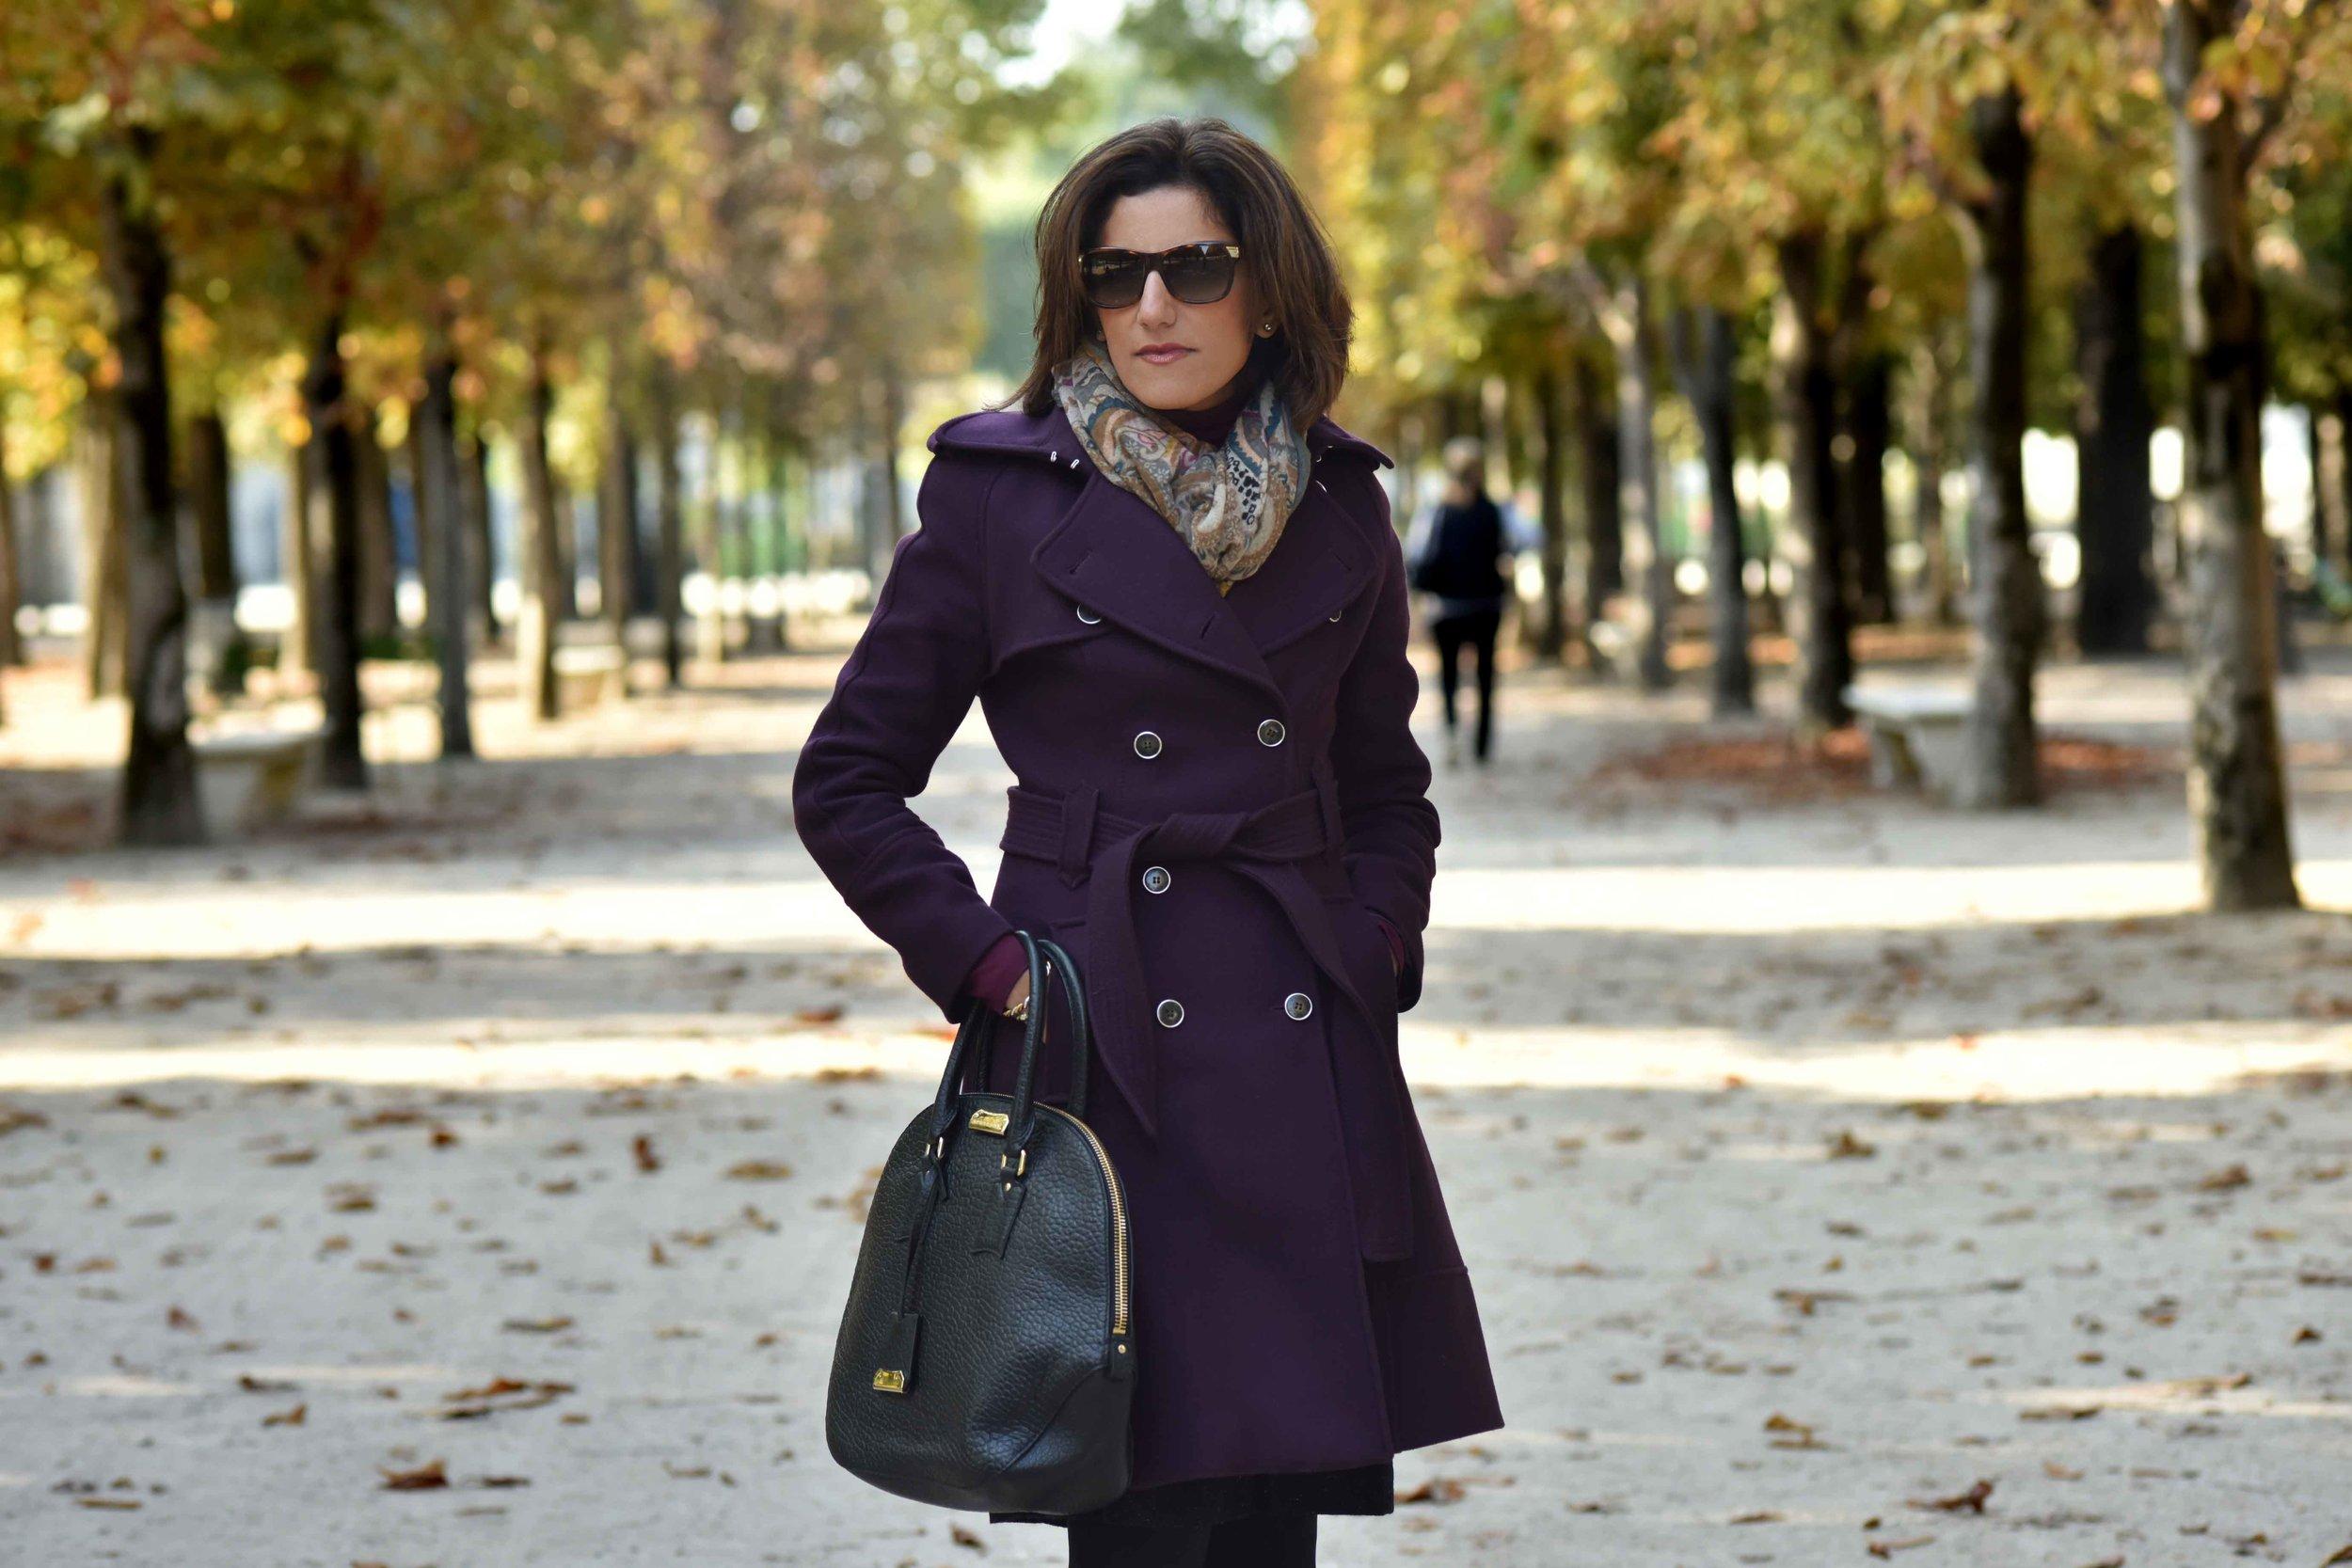 Karen Millen fall/winter coat, Burberry bag, Jardin des Tuileries, Paris, France. Photo: Nina Shaw. Image©www.thingstodot.com.